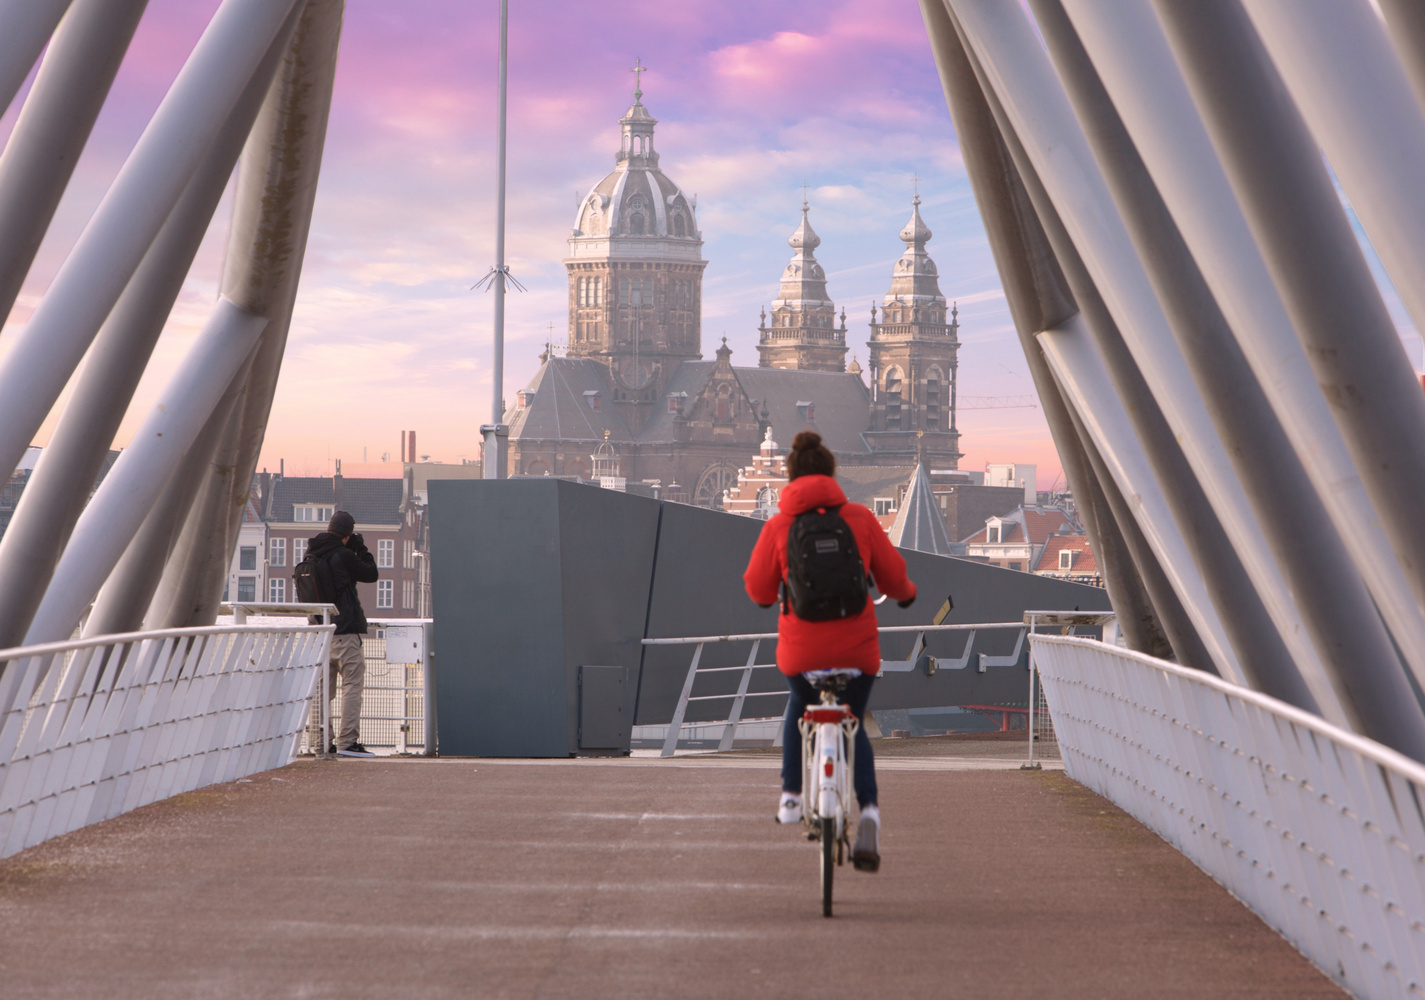 Bridge to the past by Idan York